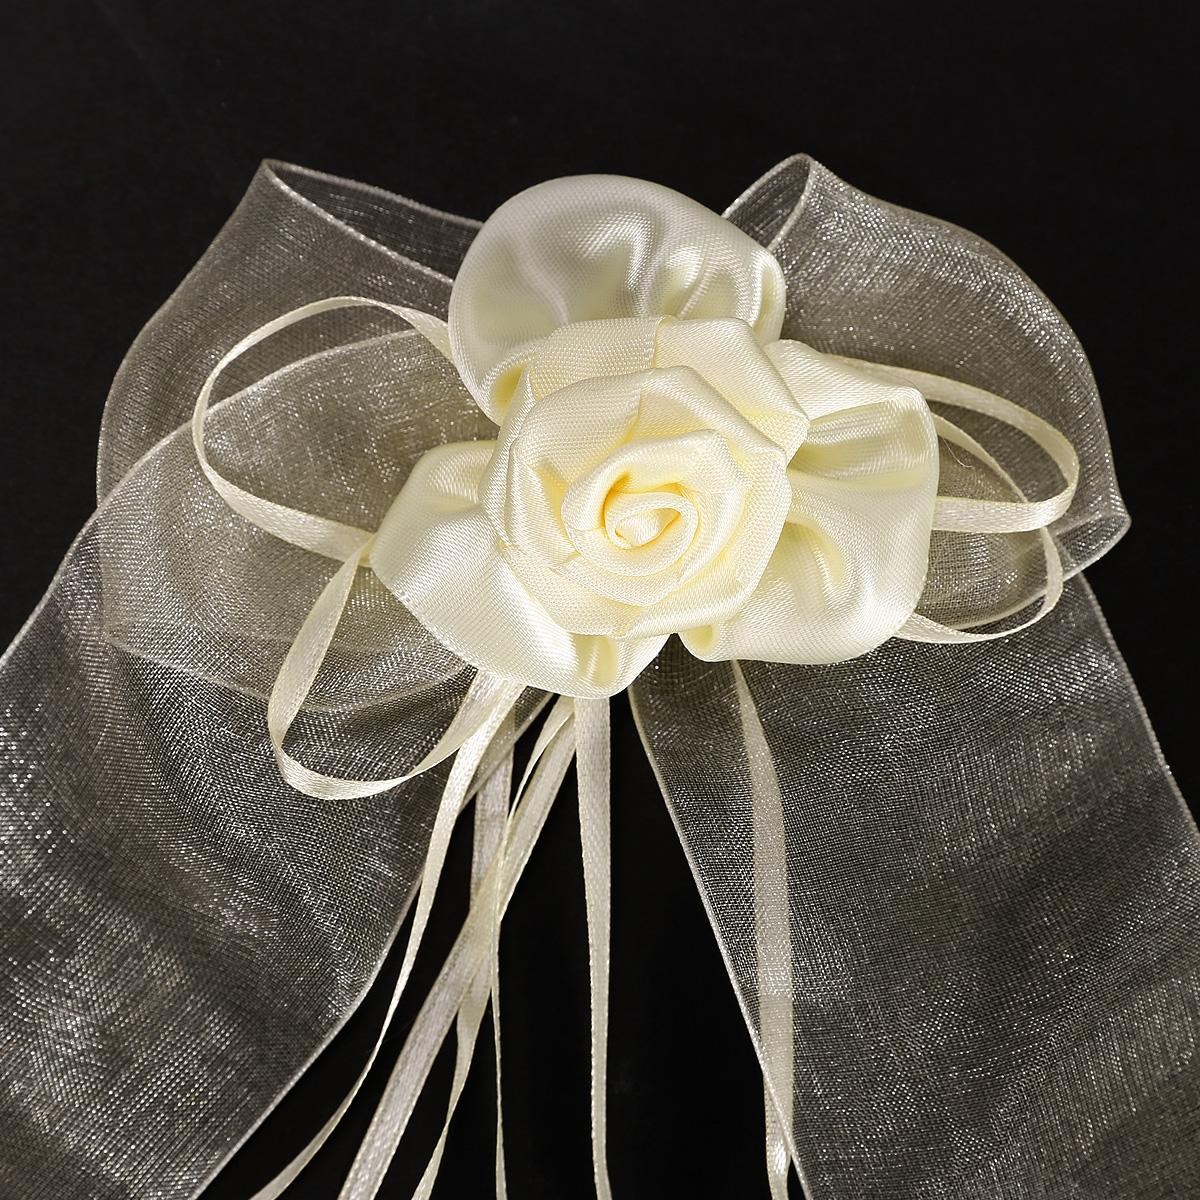 4x noeud organza fleur rose satin blanc beige h20cm 30cm voiture d coration - Voilage organza blanc ...